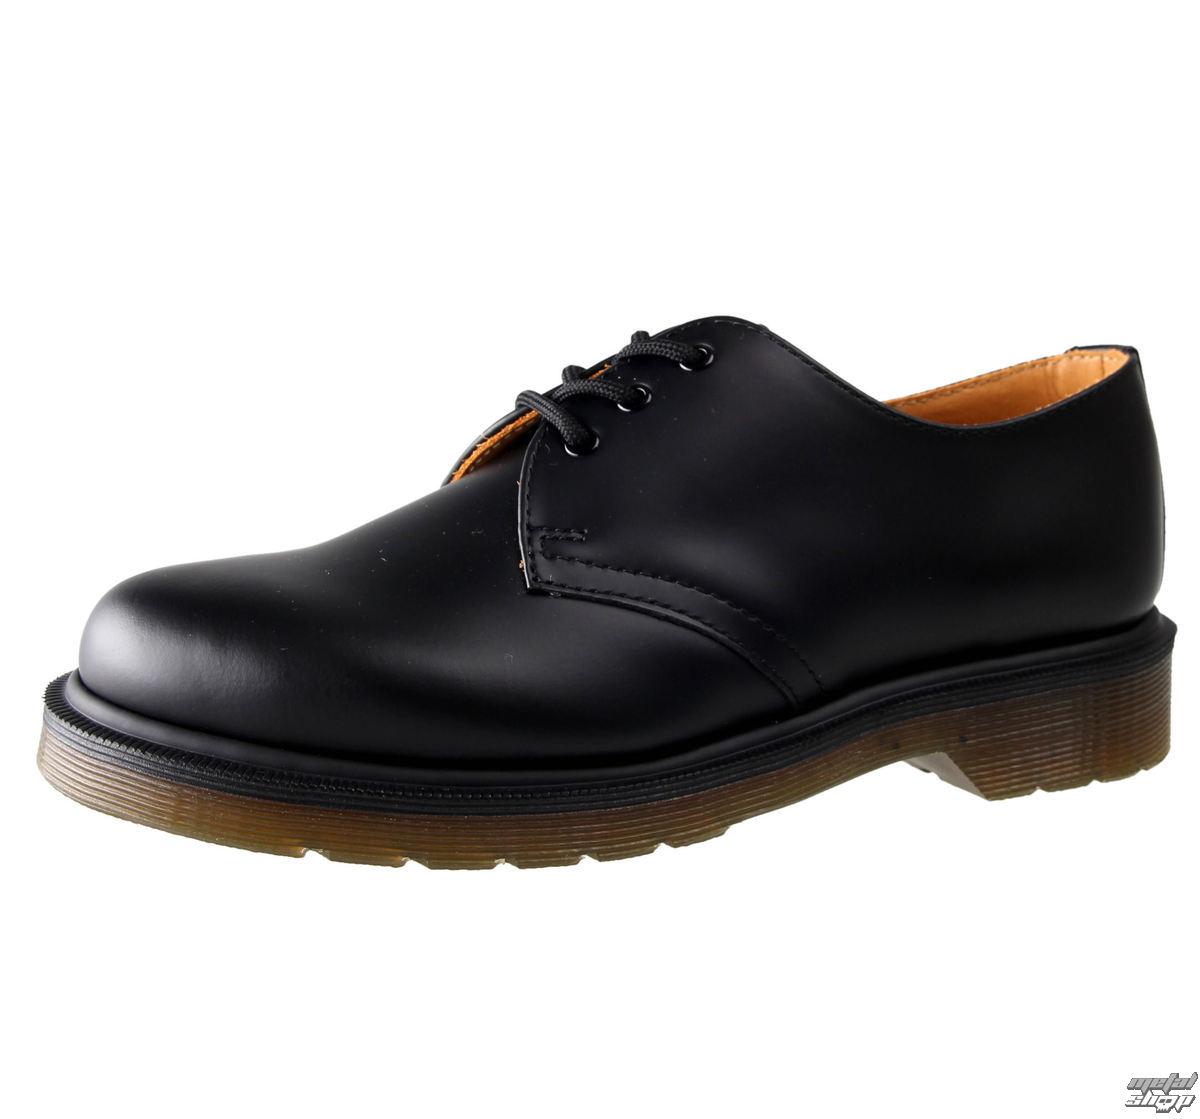 boty Dr. Martens - 3 dírkové - PW Black Smooth - 1461